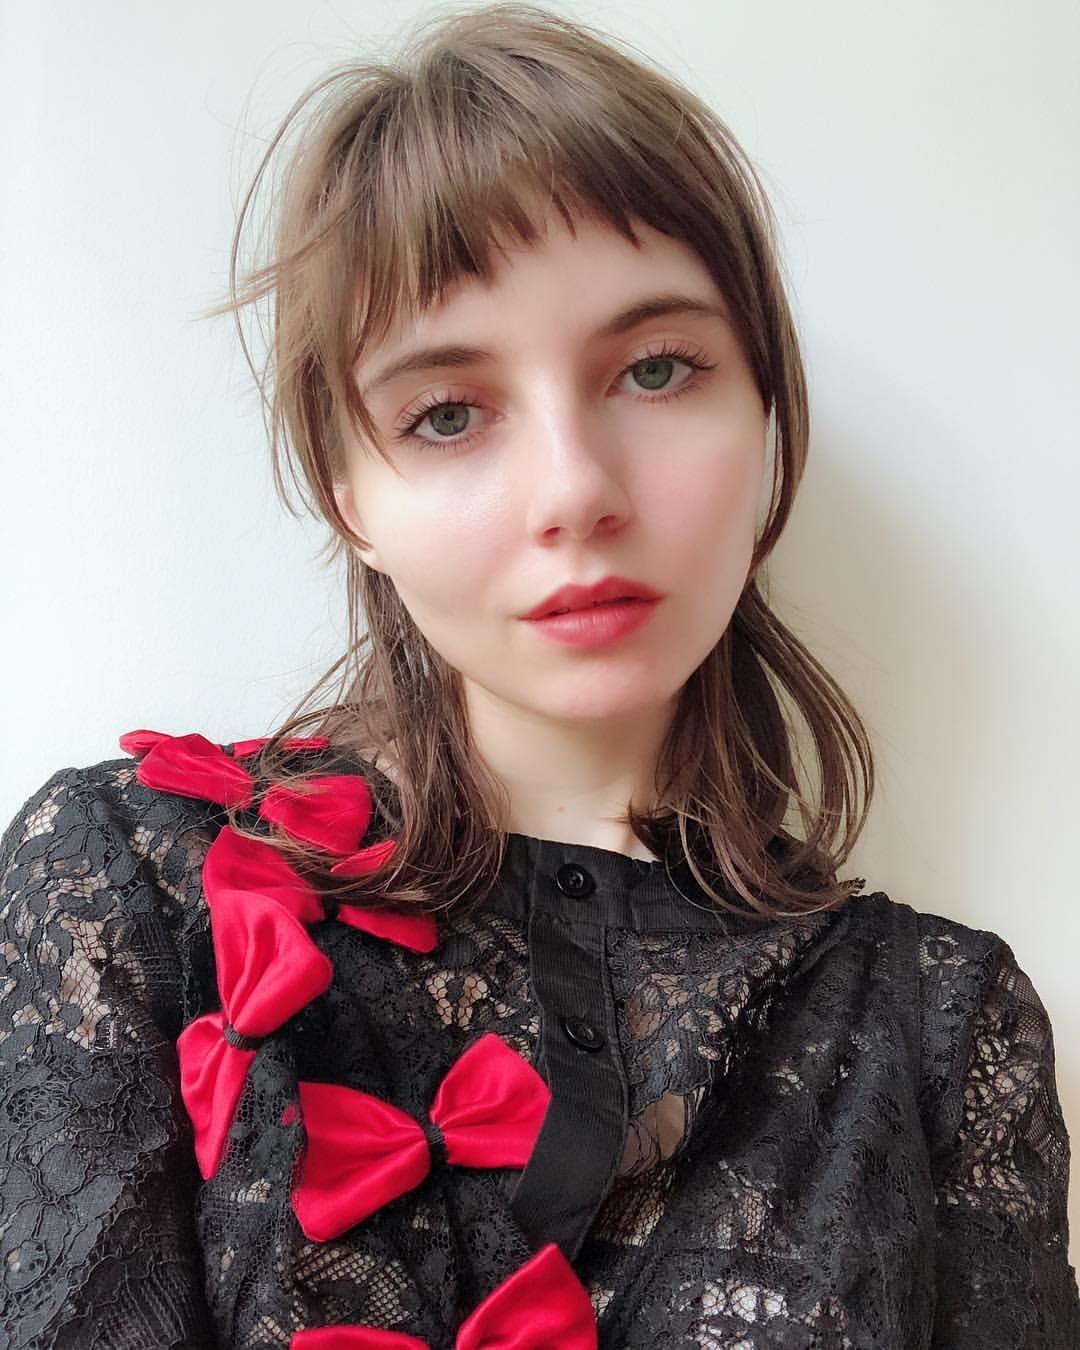 Classify American girl Liara Roux